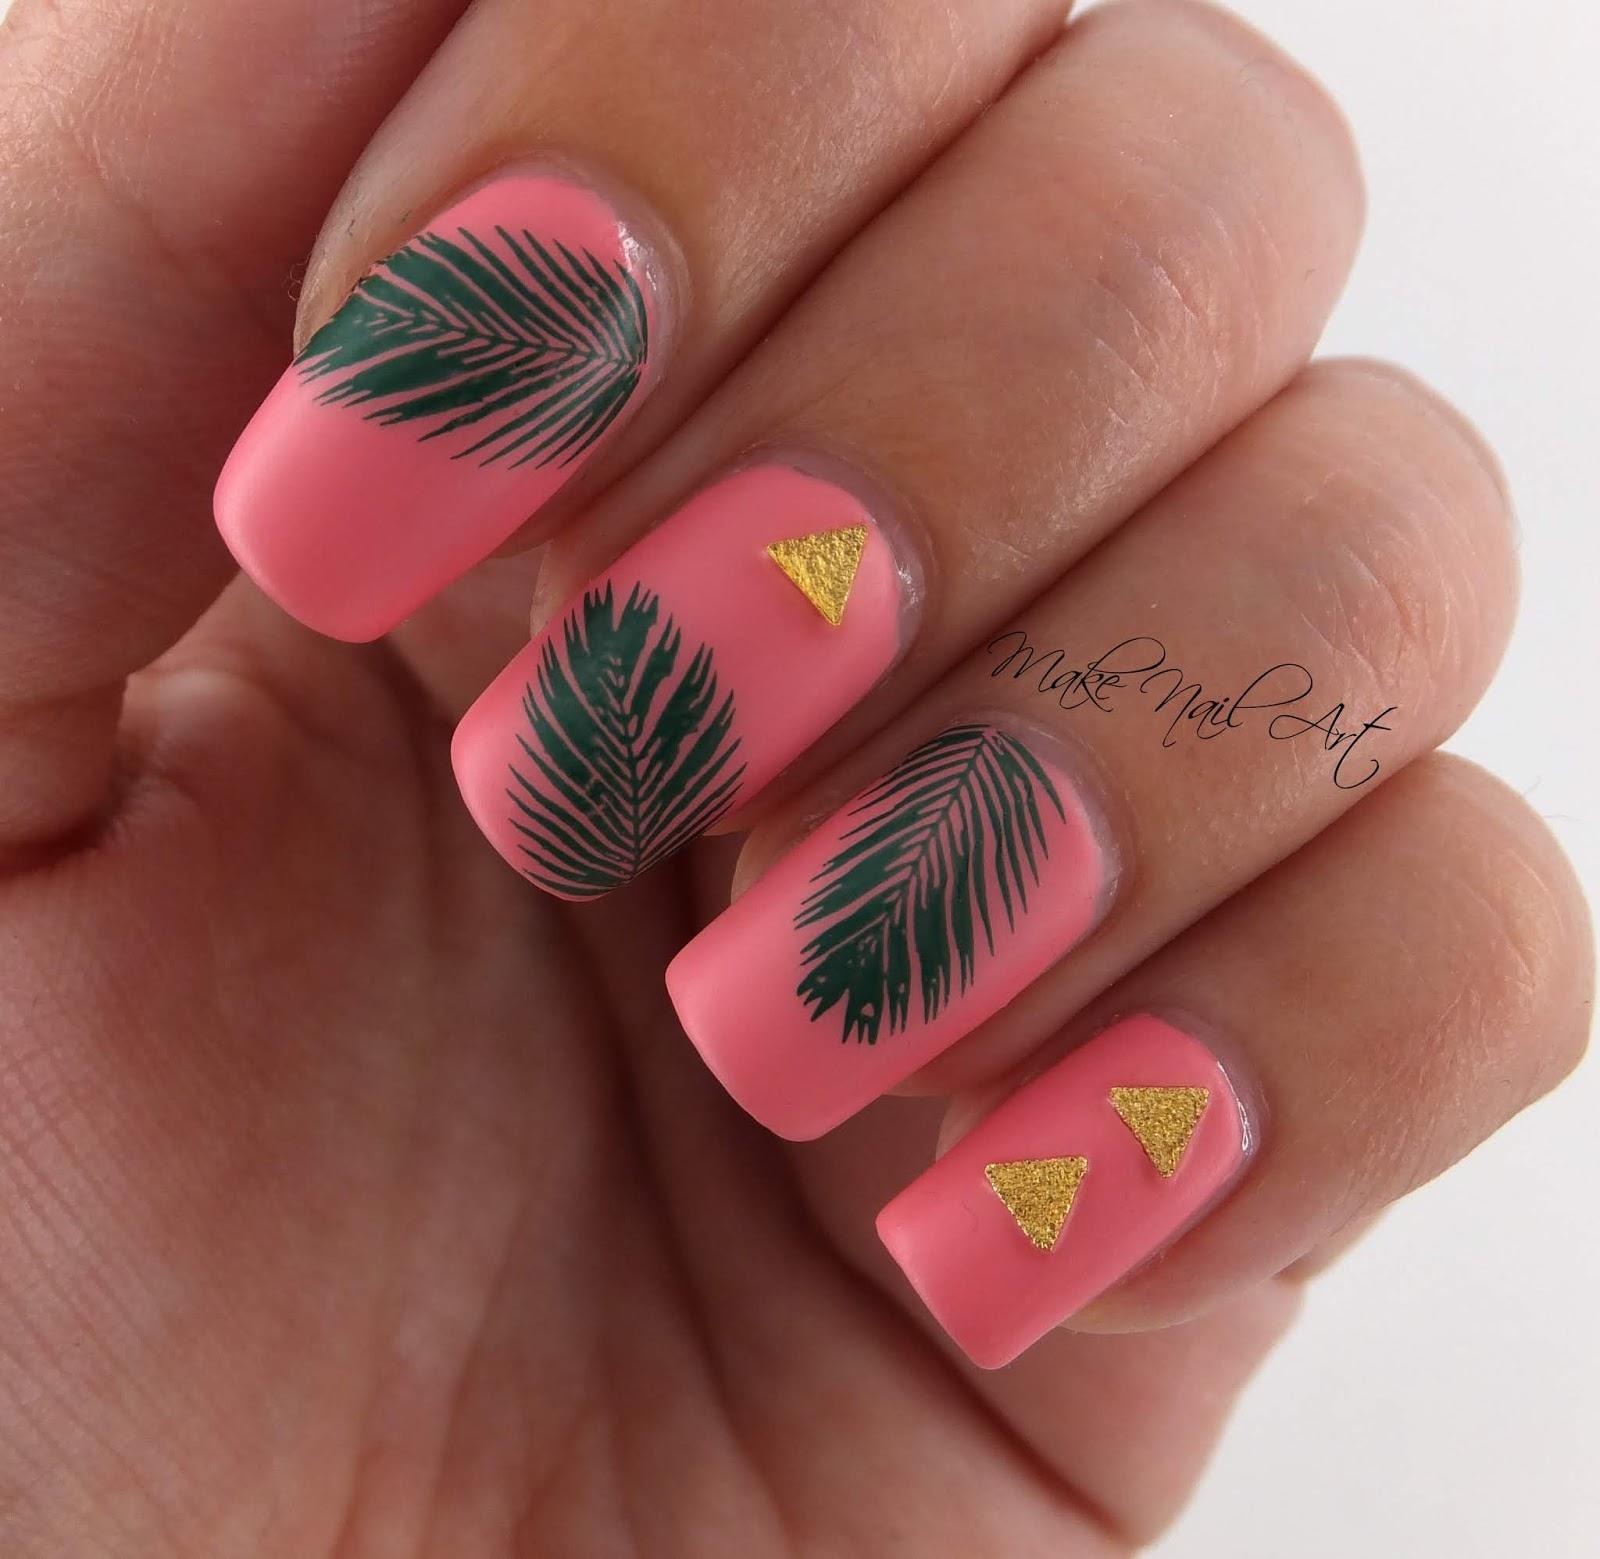 Make Nail Art: Summer Palm Leaves Nail Art Design Tutorial